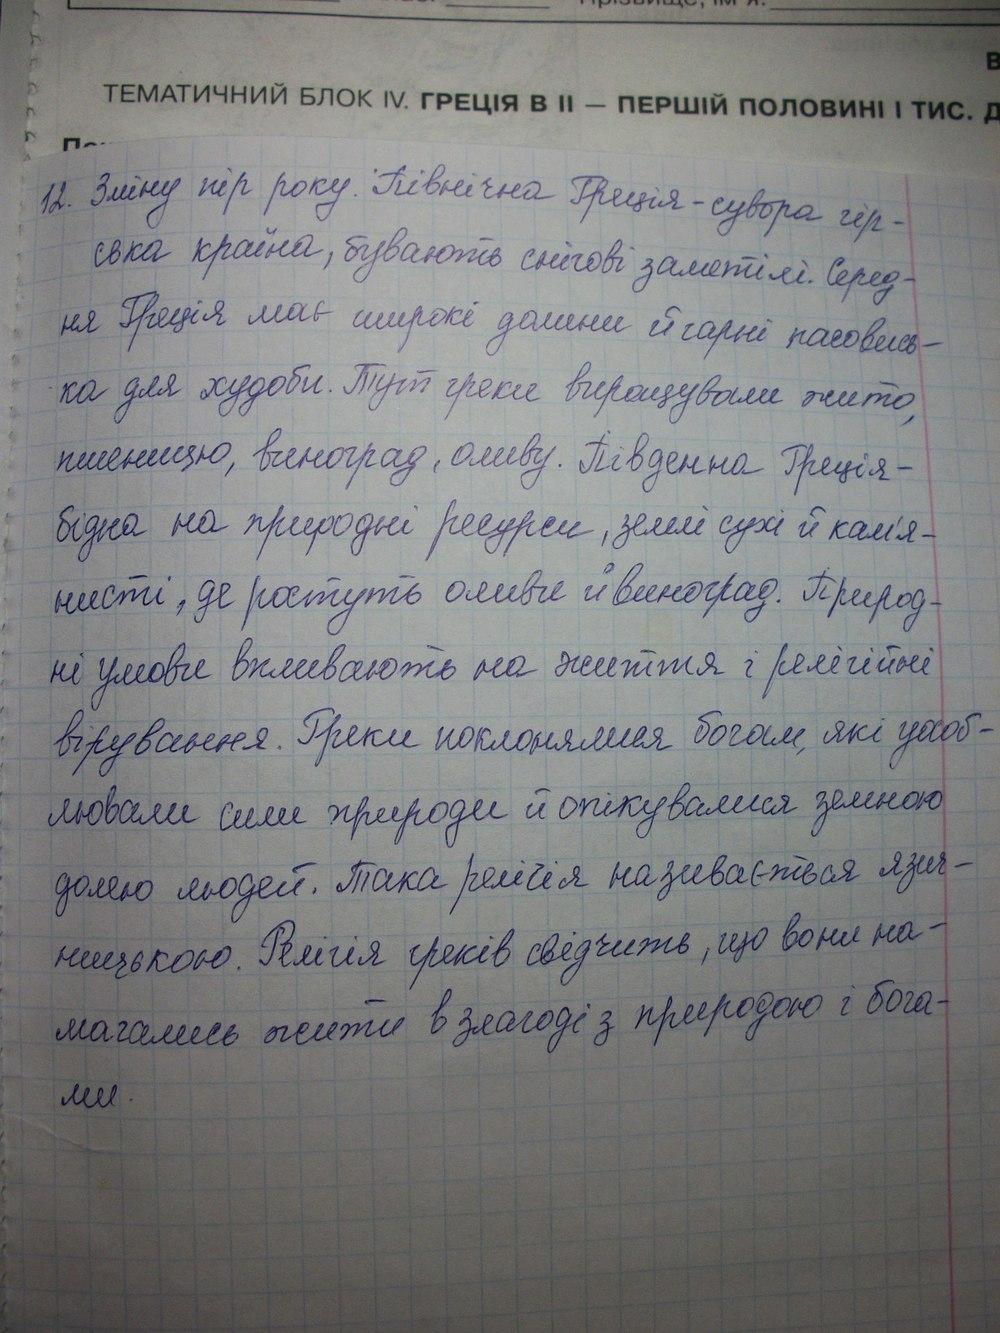 ГДЗ рабочие тетради 6 класс. Задание: стр. 24 (2)